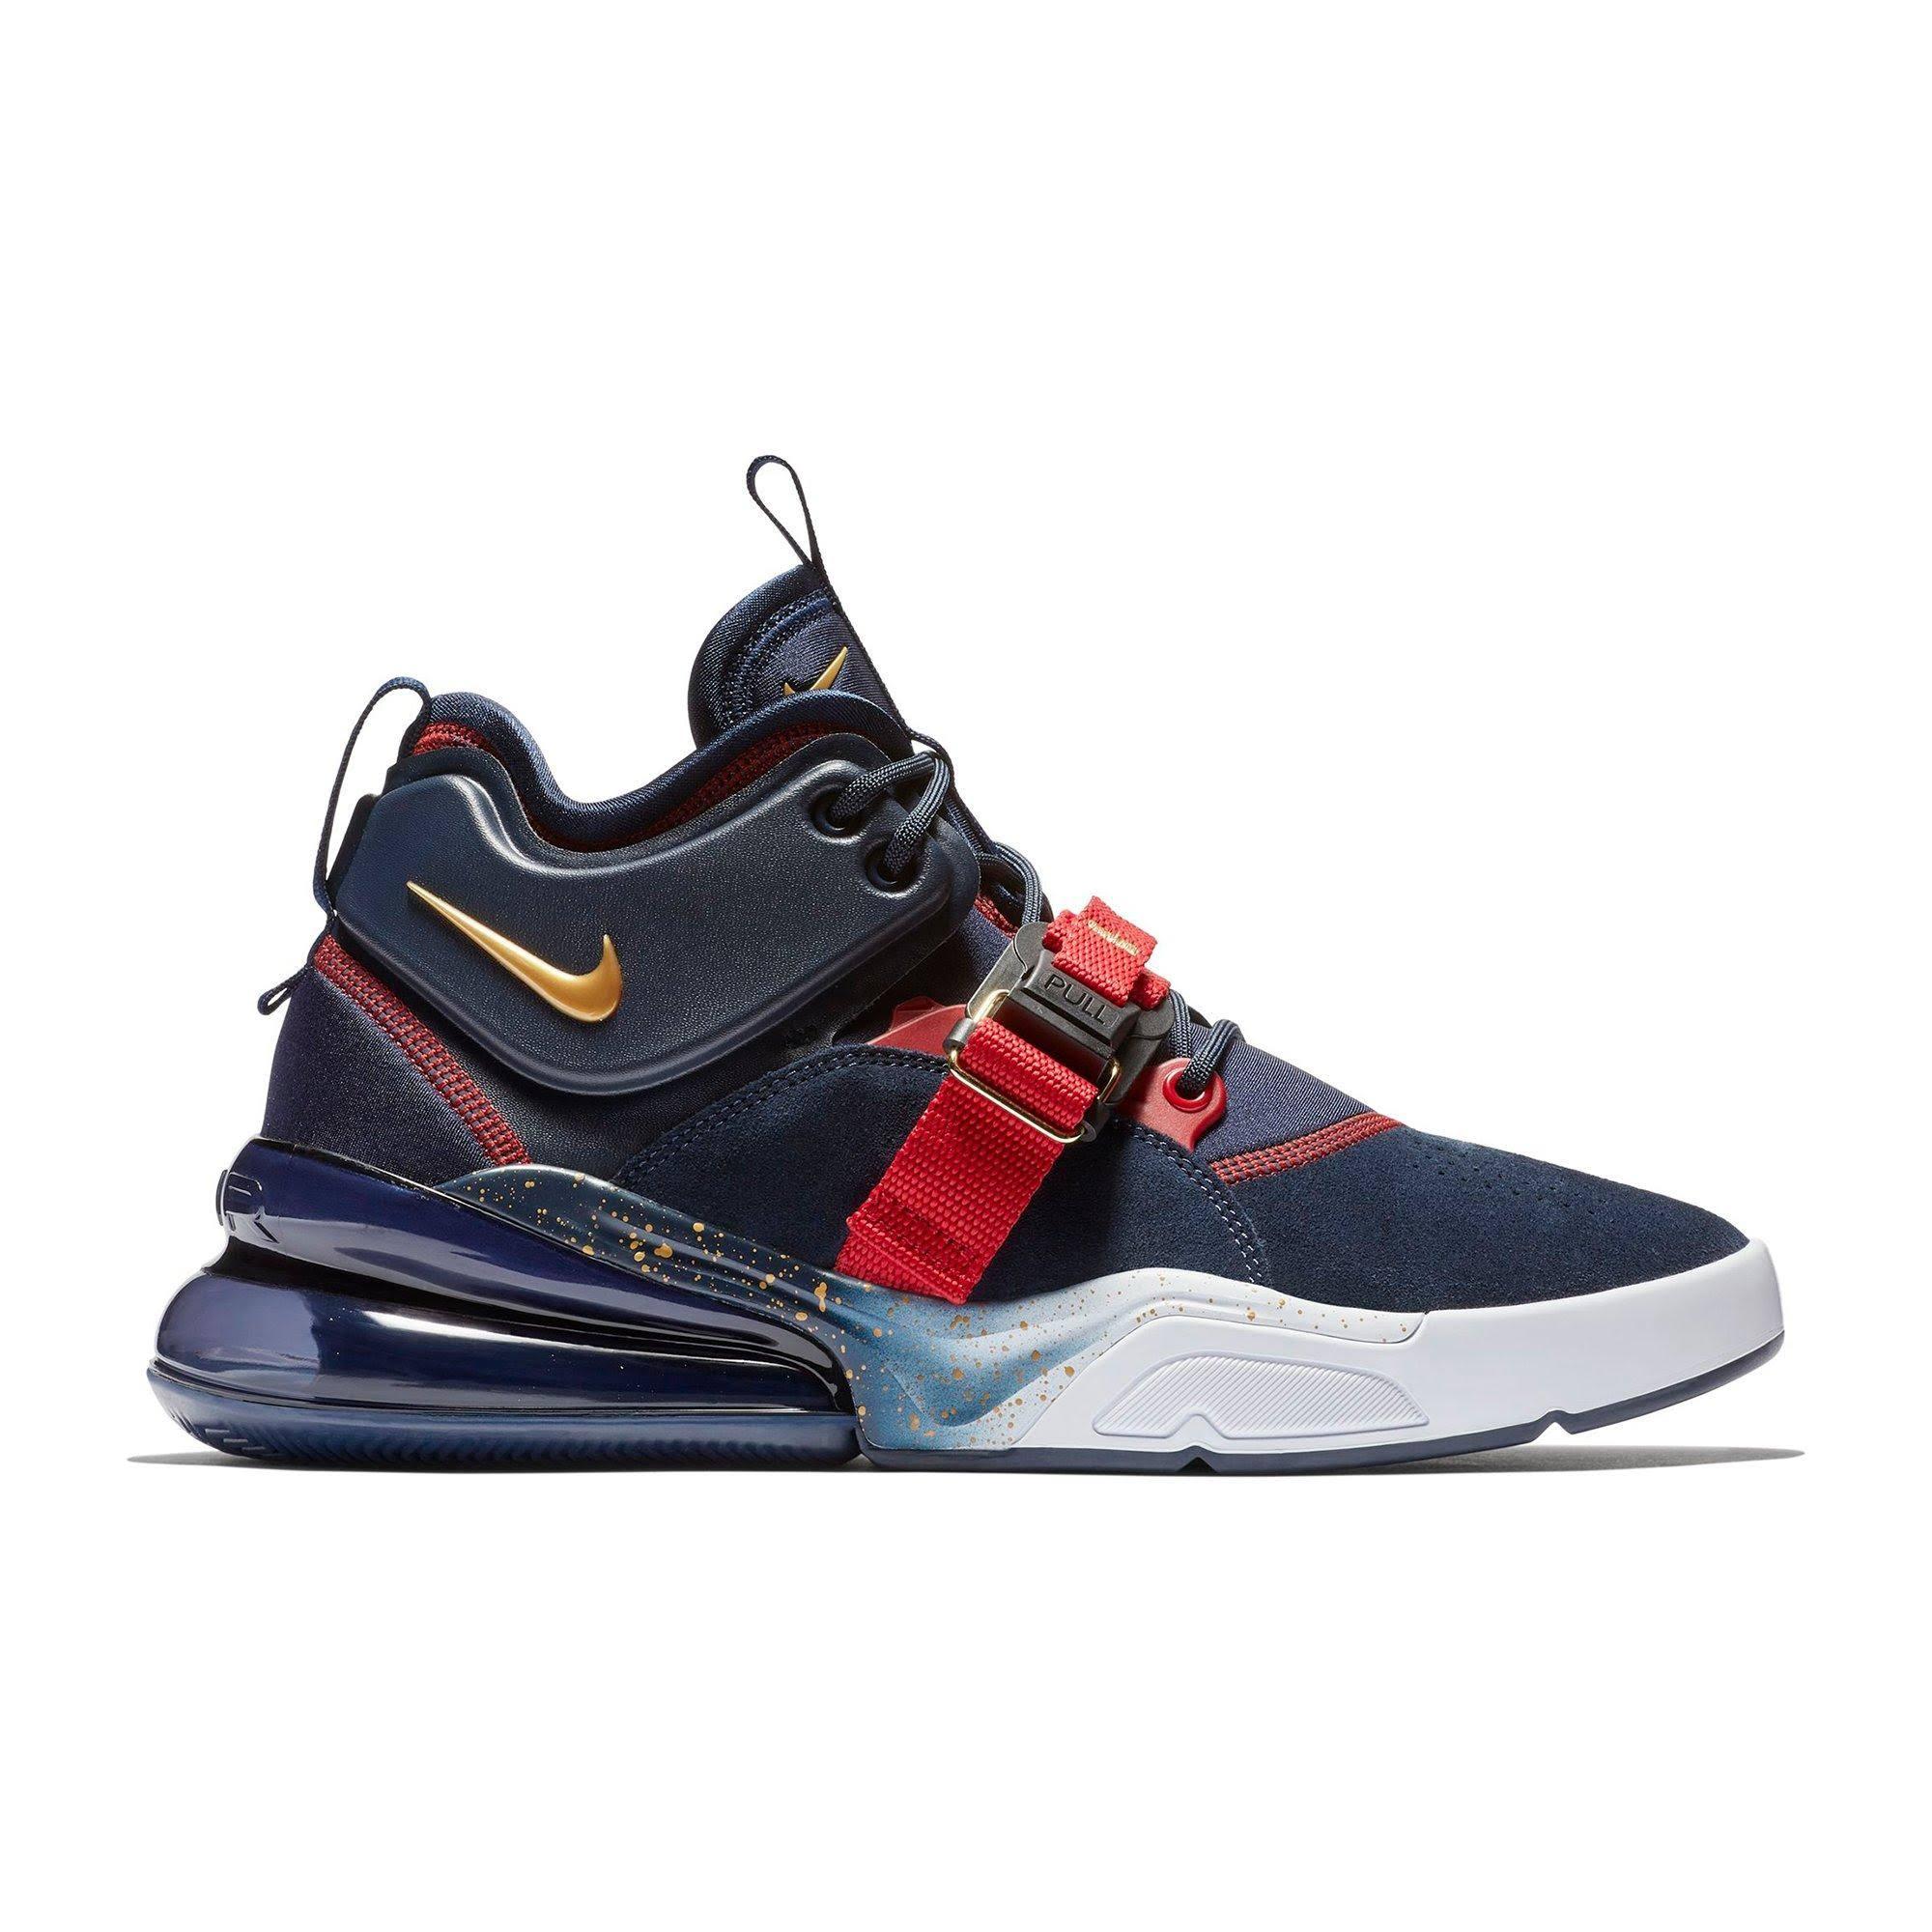 Tamaño Nike 8 270 Force Air Para Zapatos Hombre Ah6772400 6SC1xP